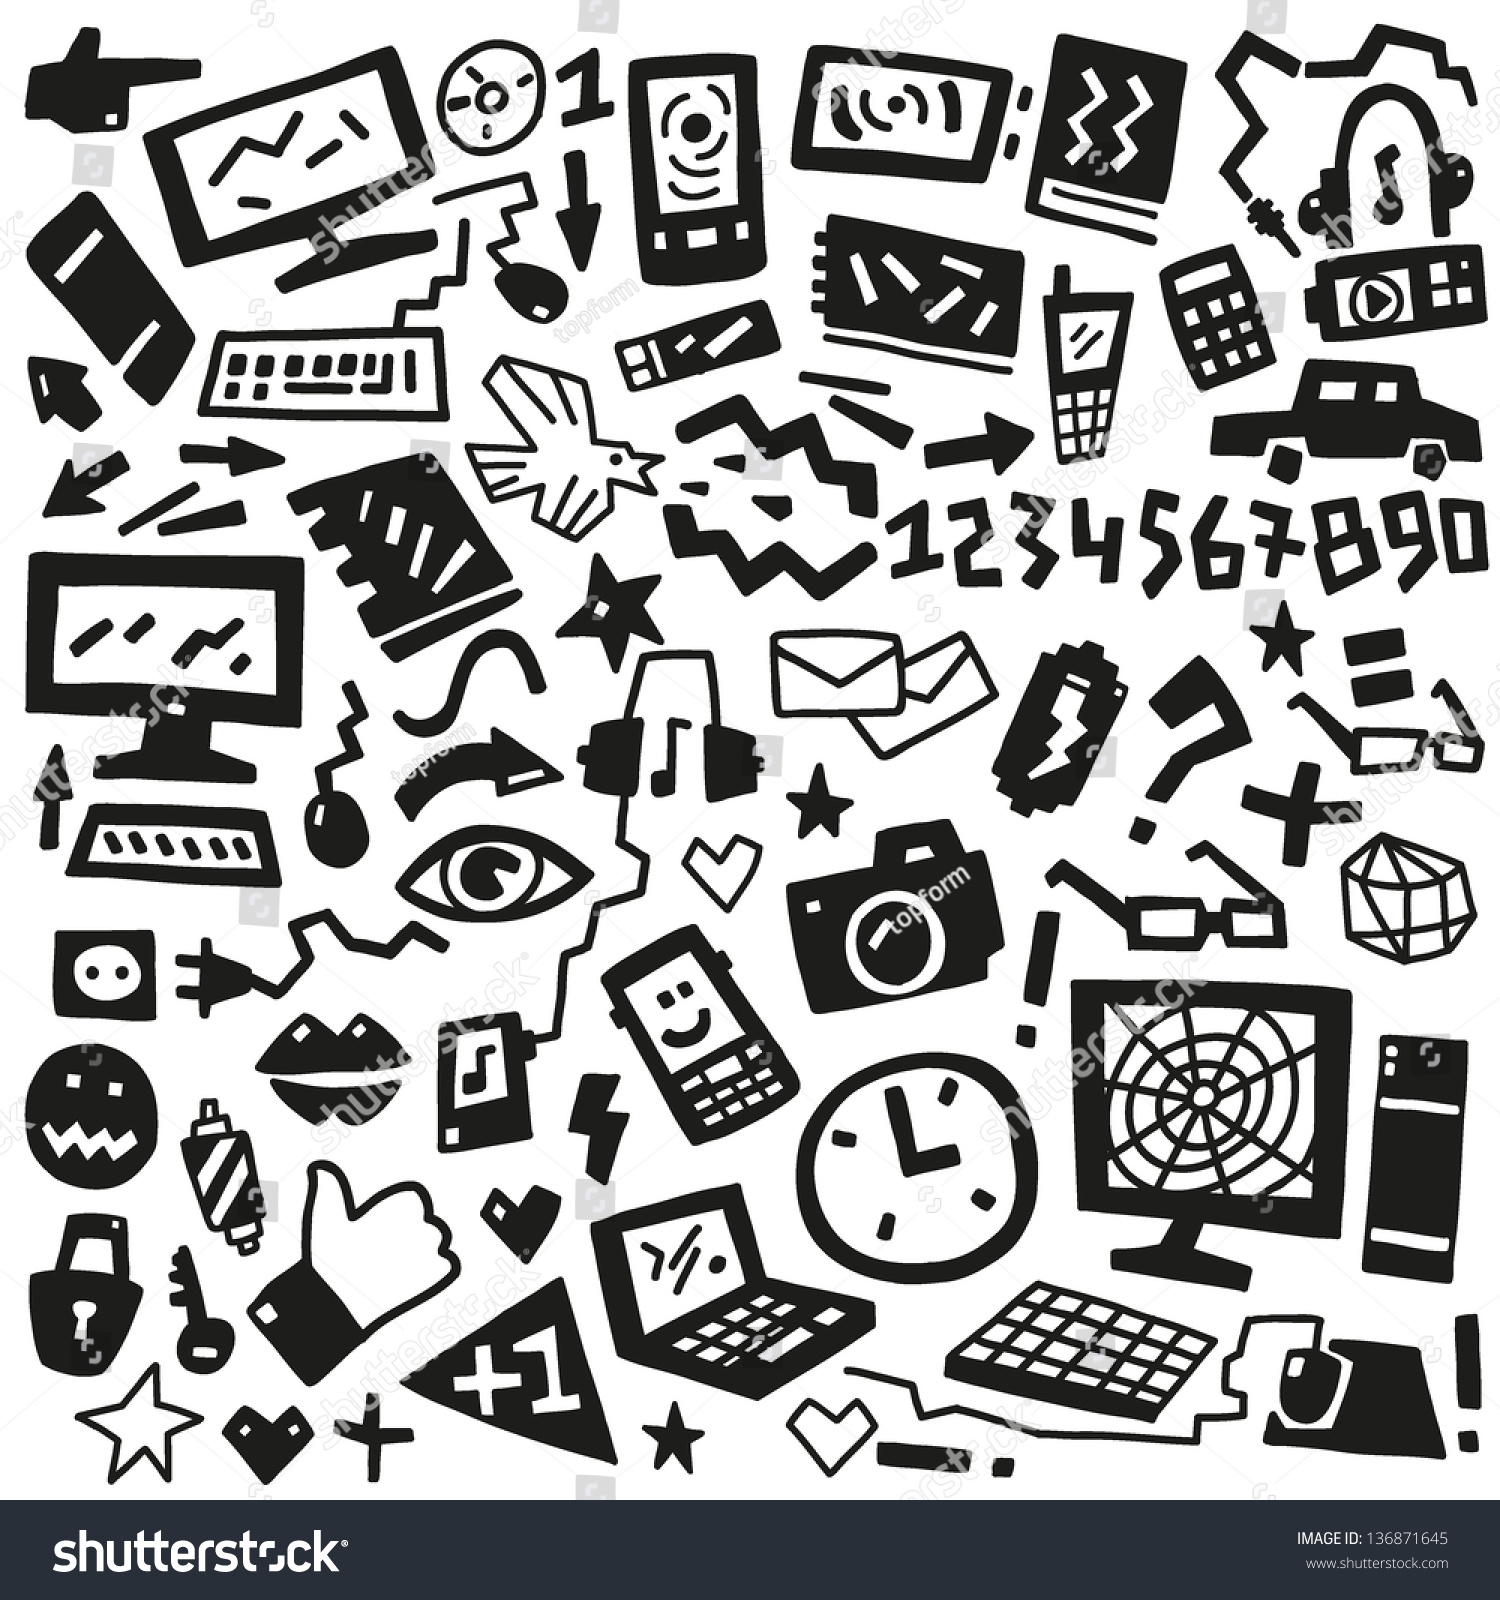 Technology Doodles Stock Vector Illustration 136871645 ...